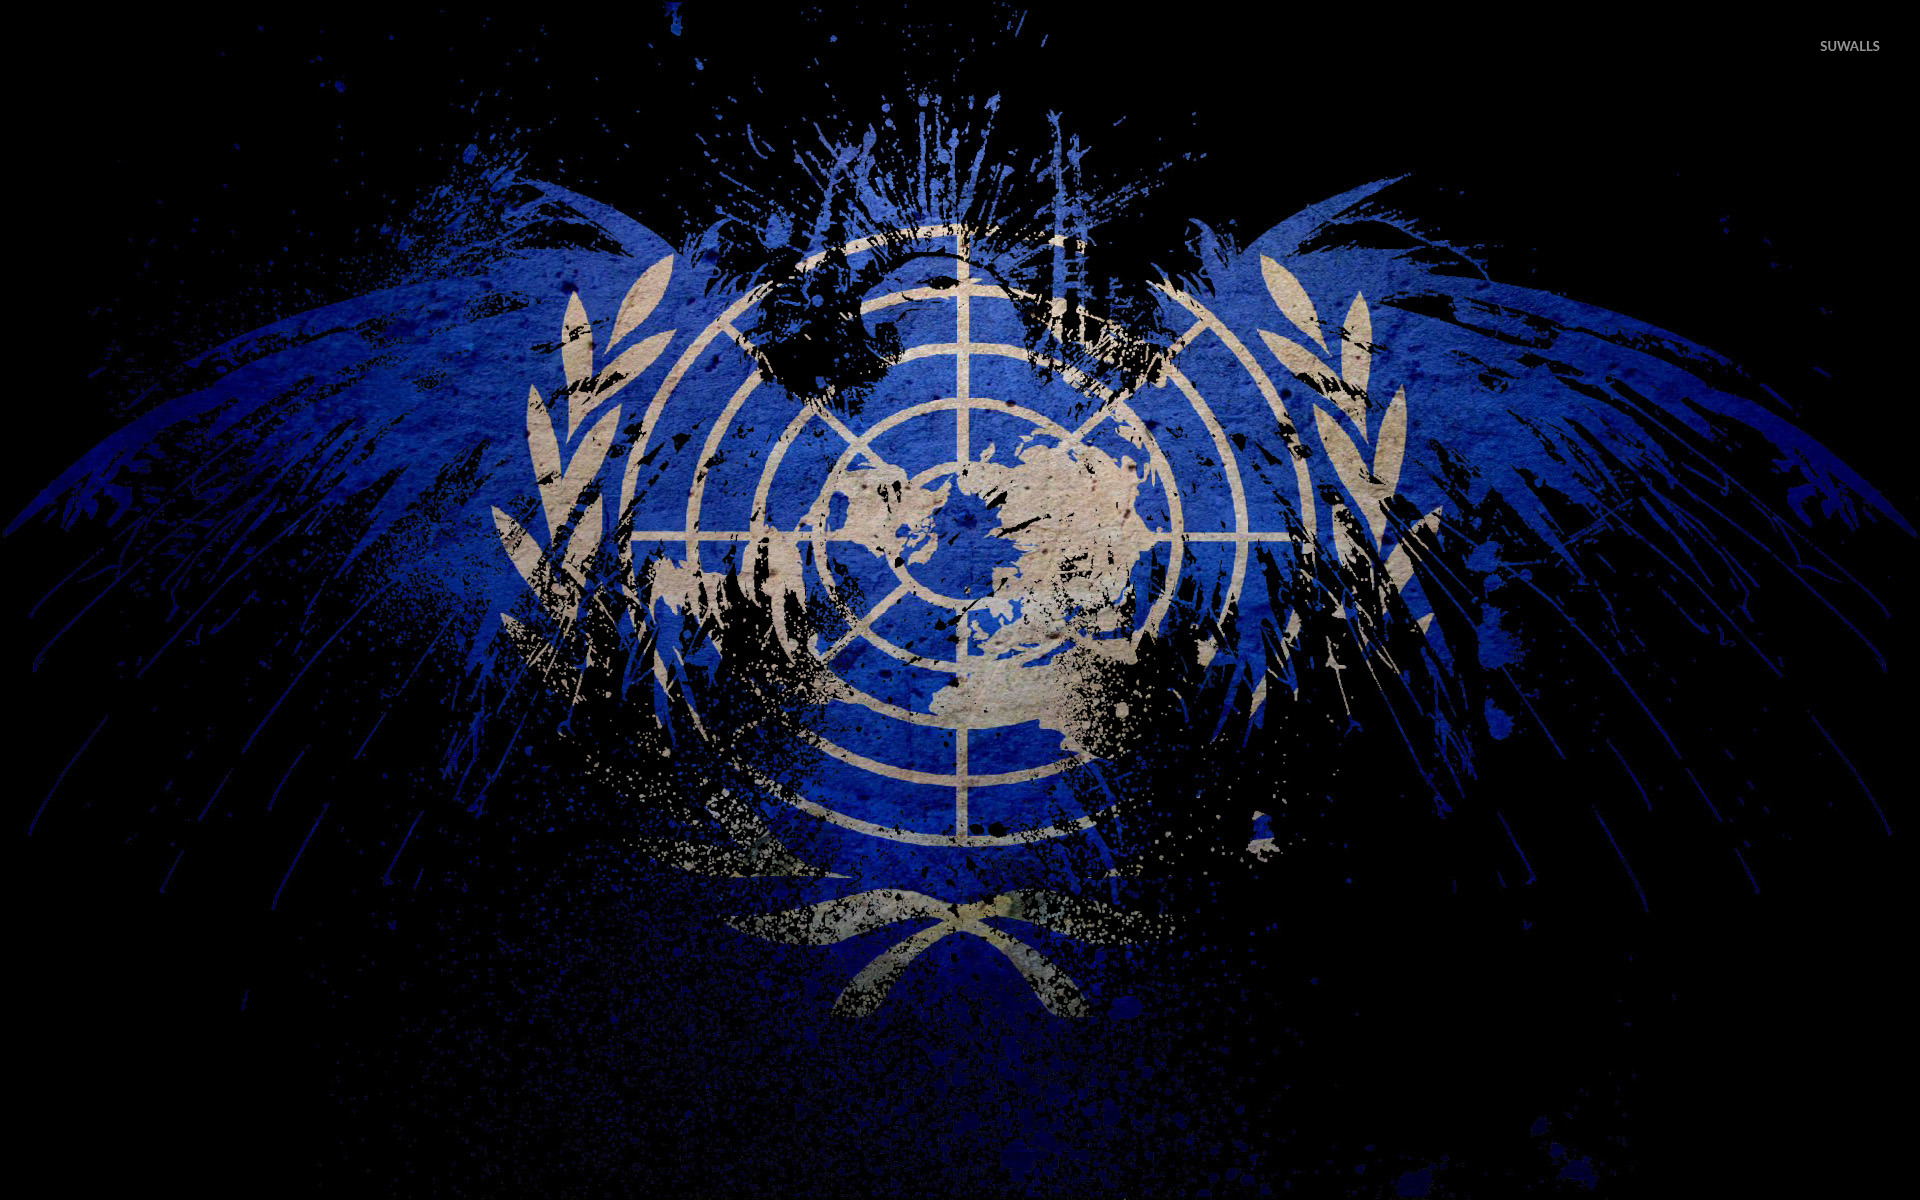 Flag of United Nations wallpaper   Digital Art wallpapers   38962 1920x1200